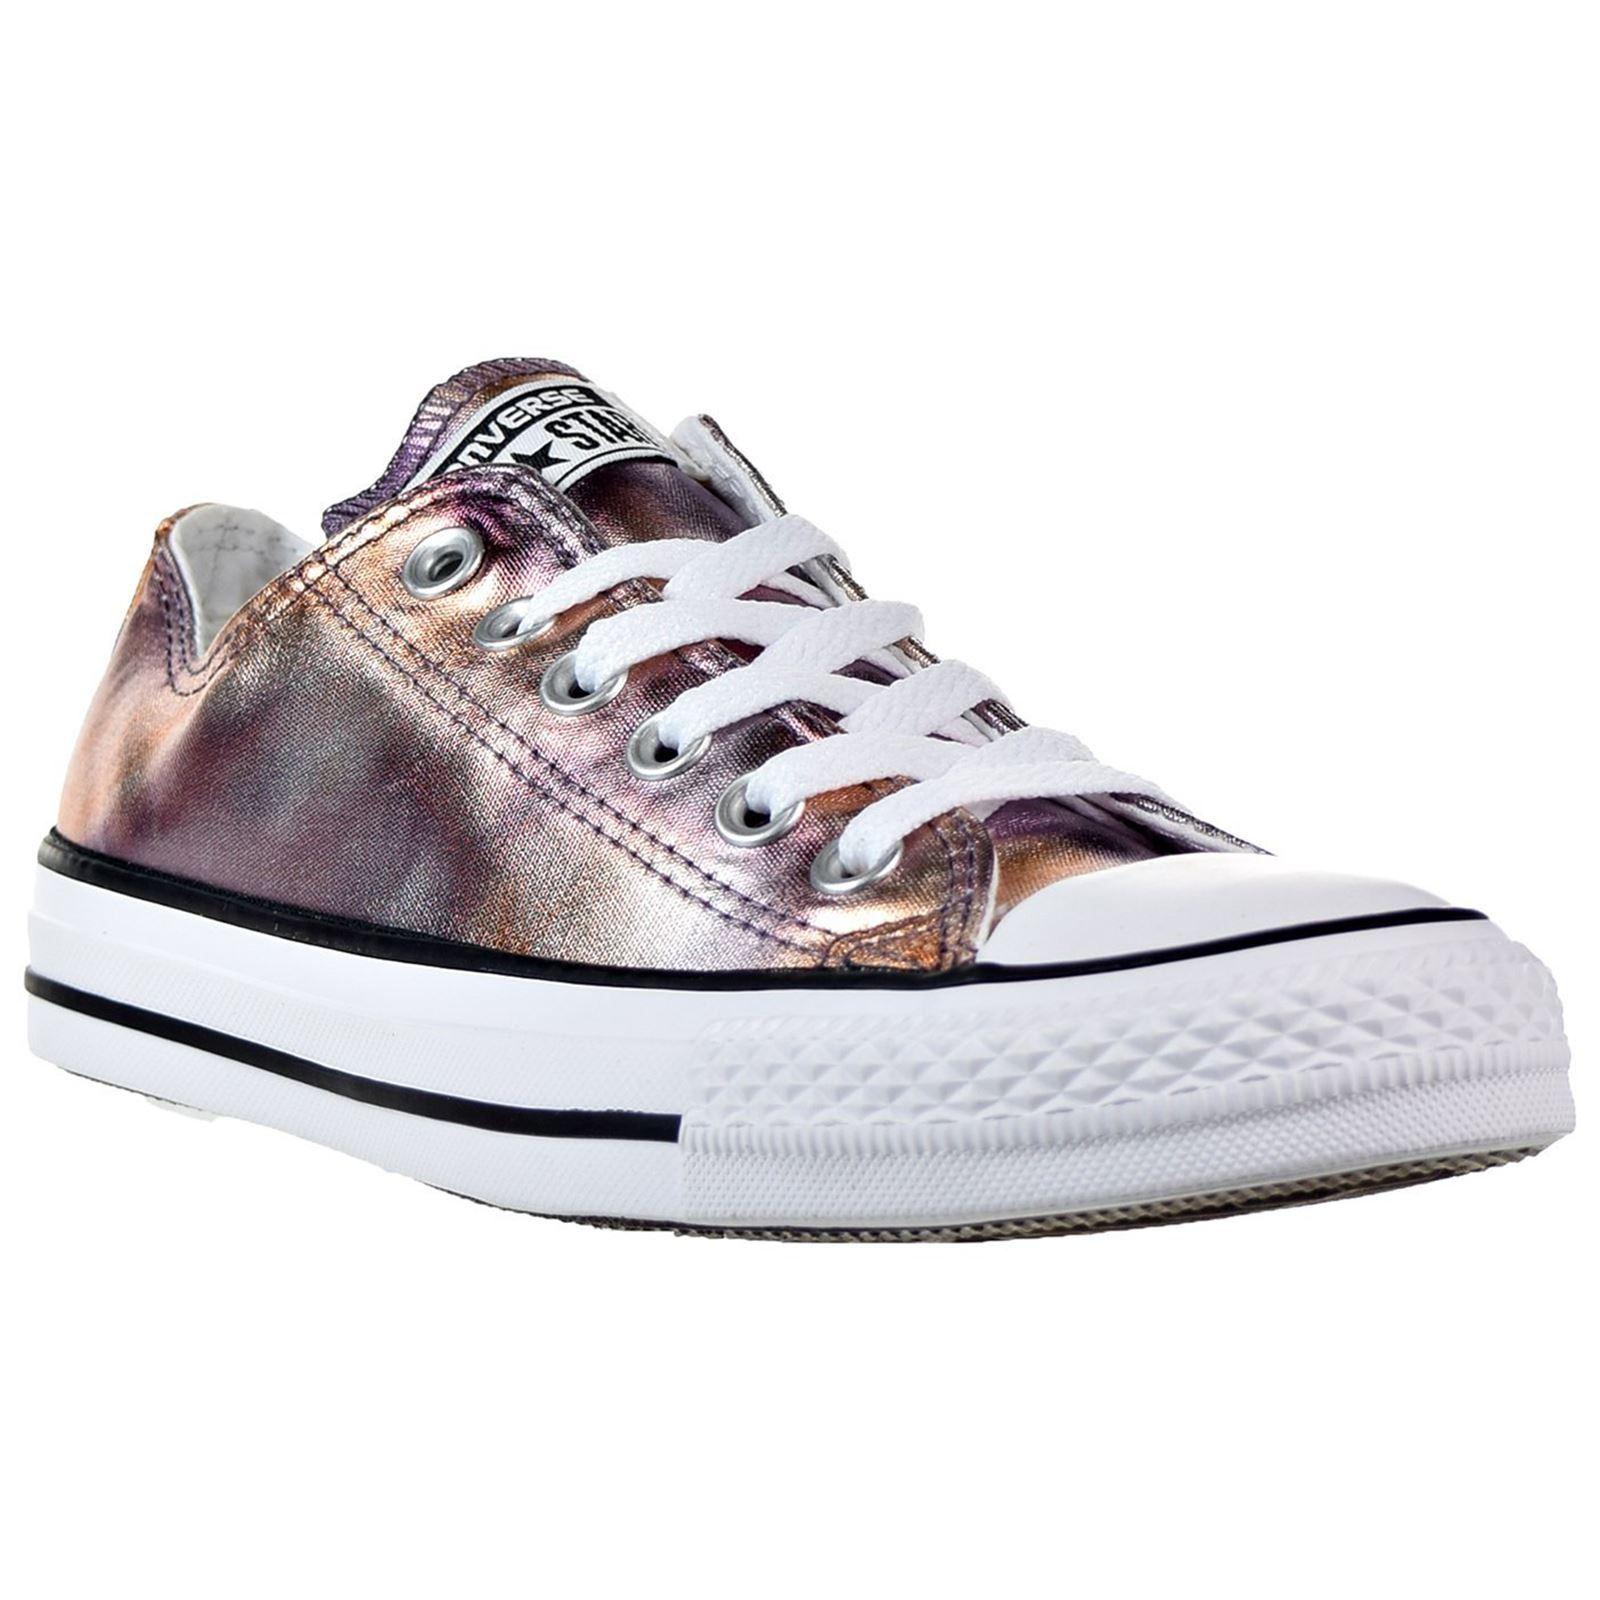 d6aff654b10c0d Converse Chuck Taylor All Star Ox Dusk Pink White Women Canvas Metallic  Trainers